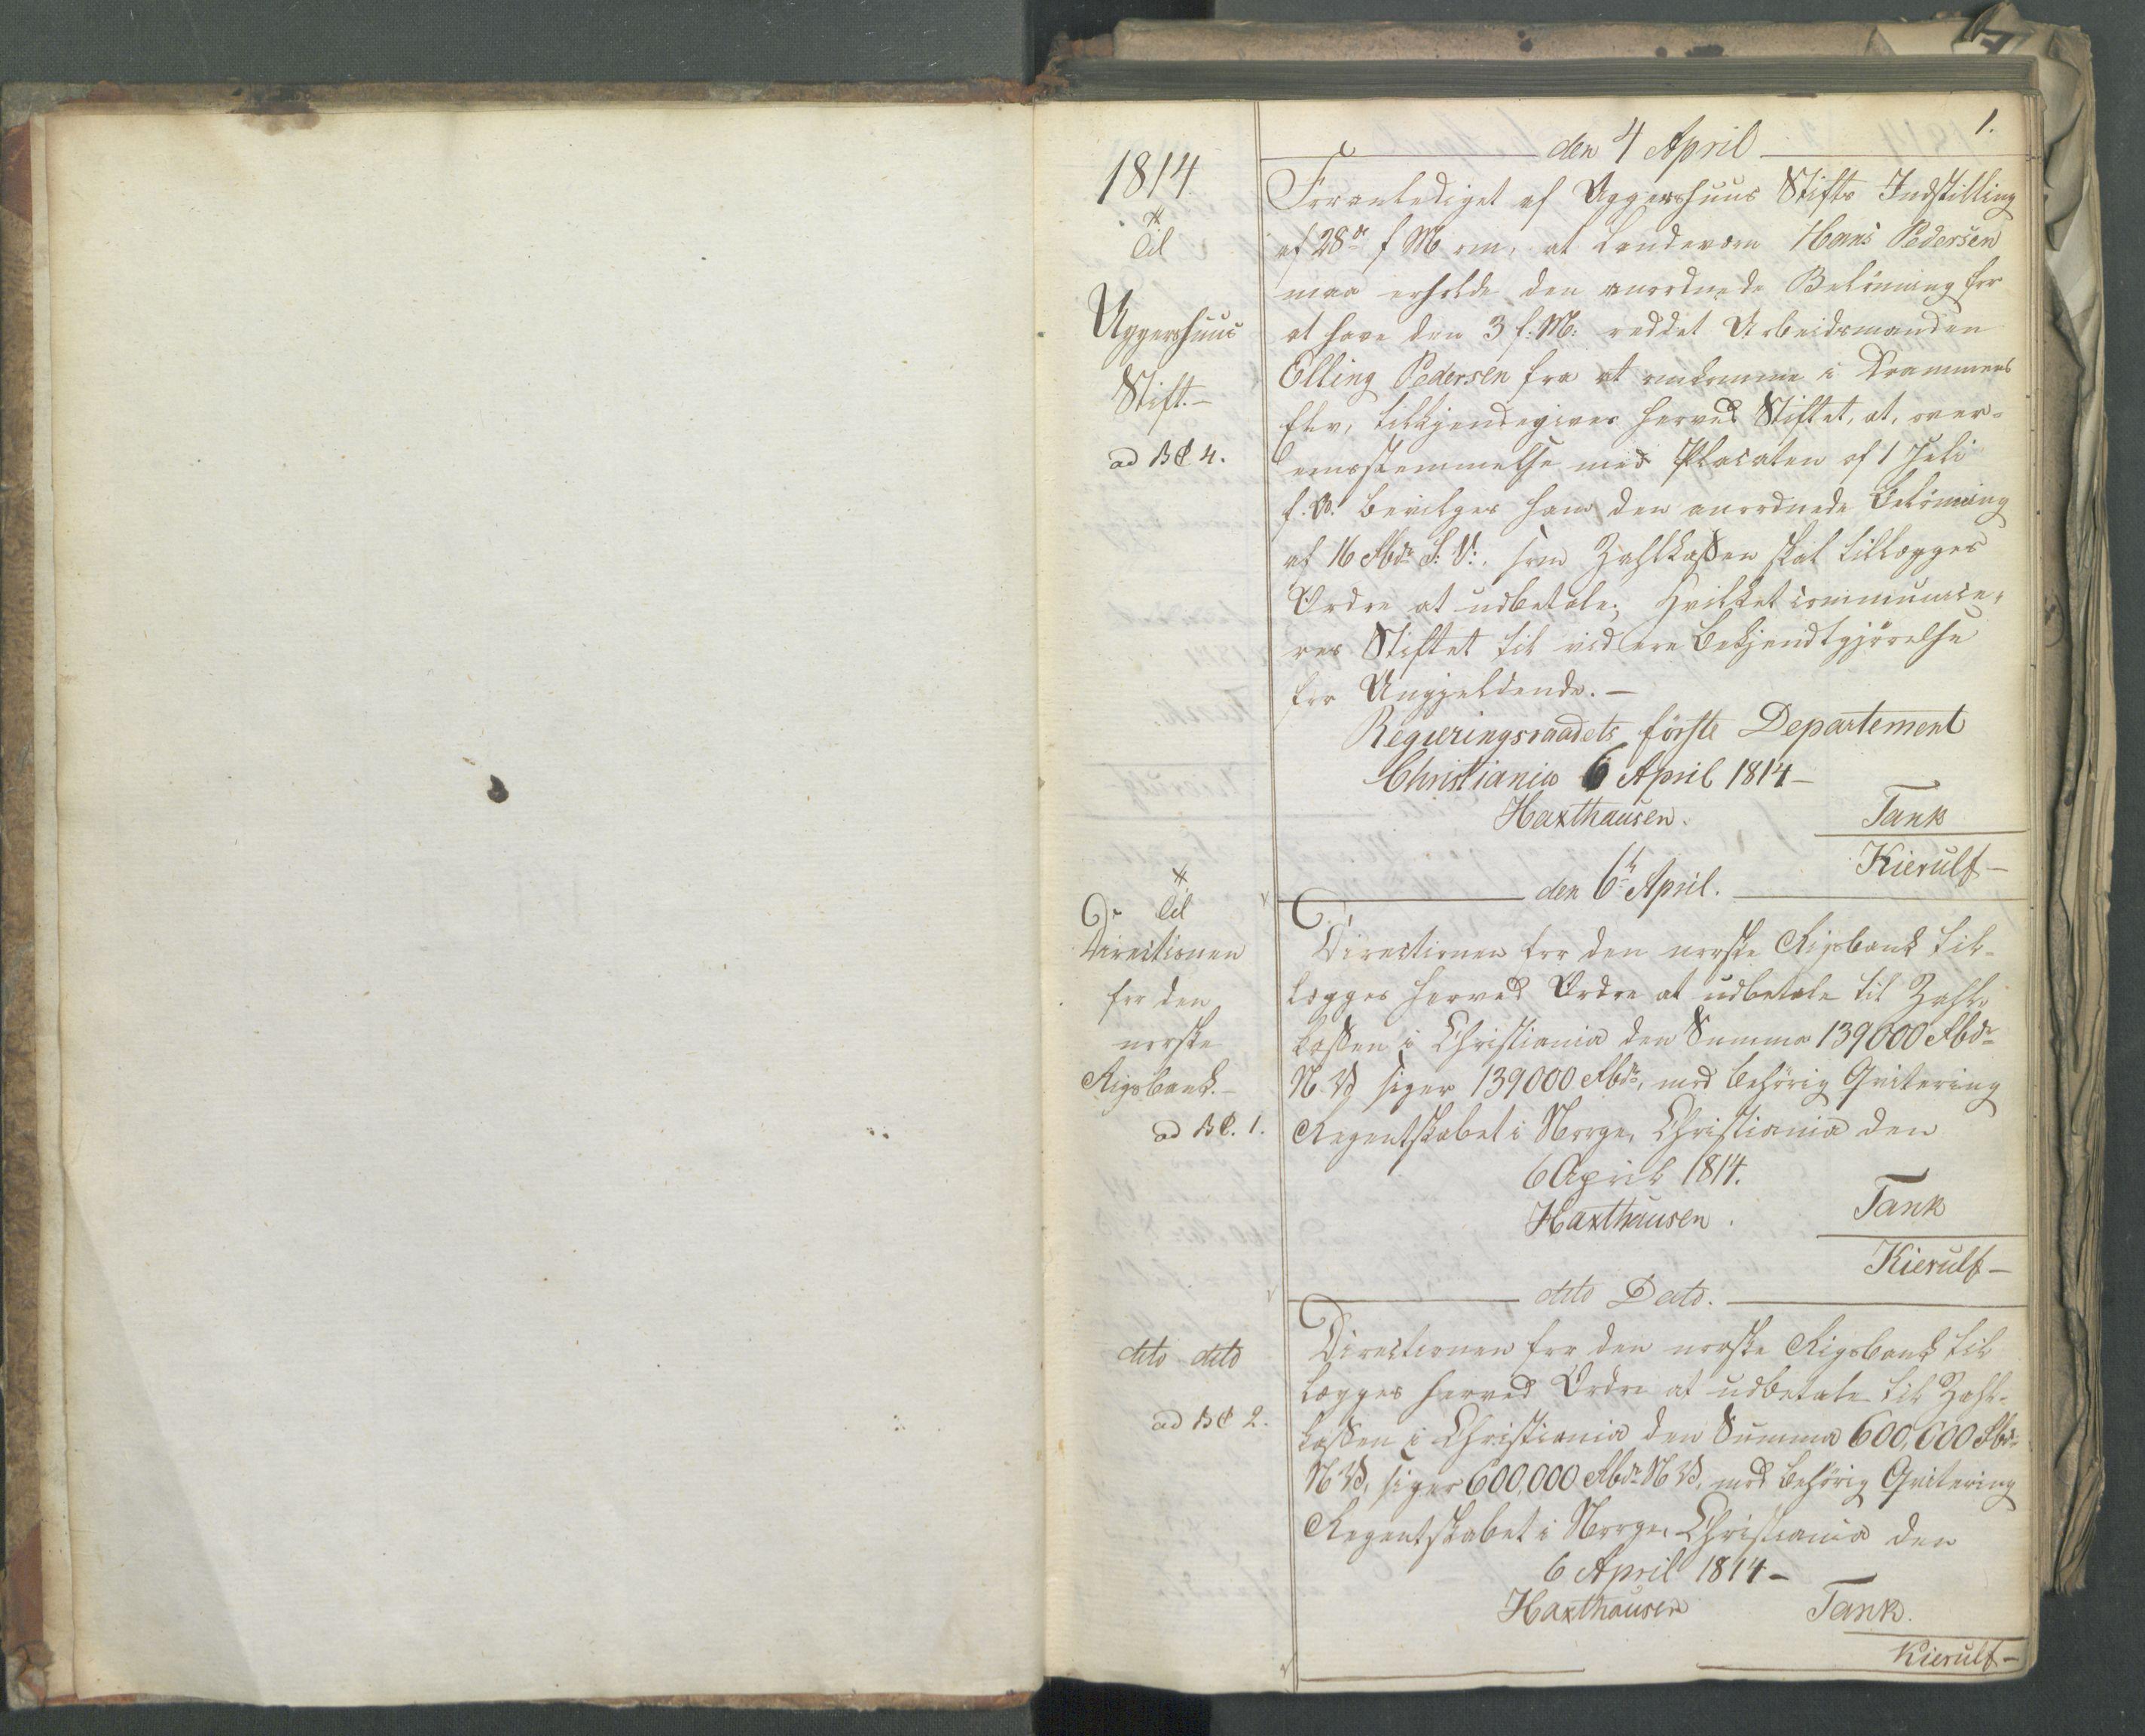 RA, Departementene i 1814, Fa/L0011: Bokholderkontoret - Kopibok, 1814, s. 1